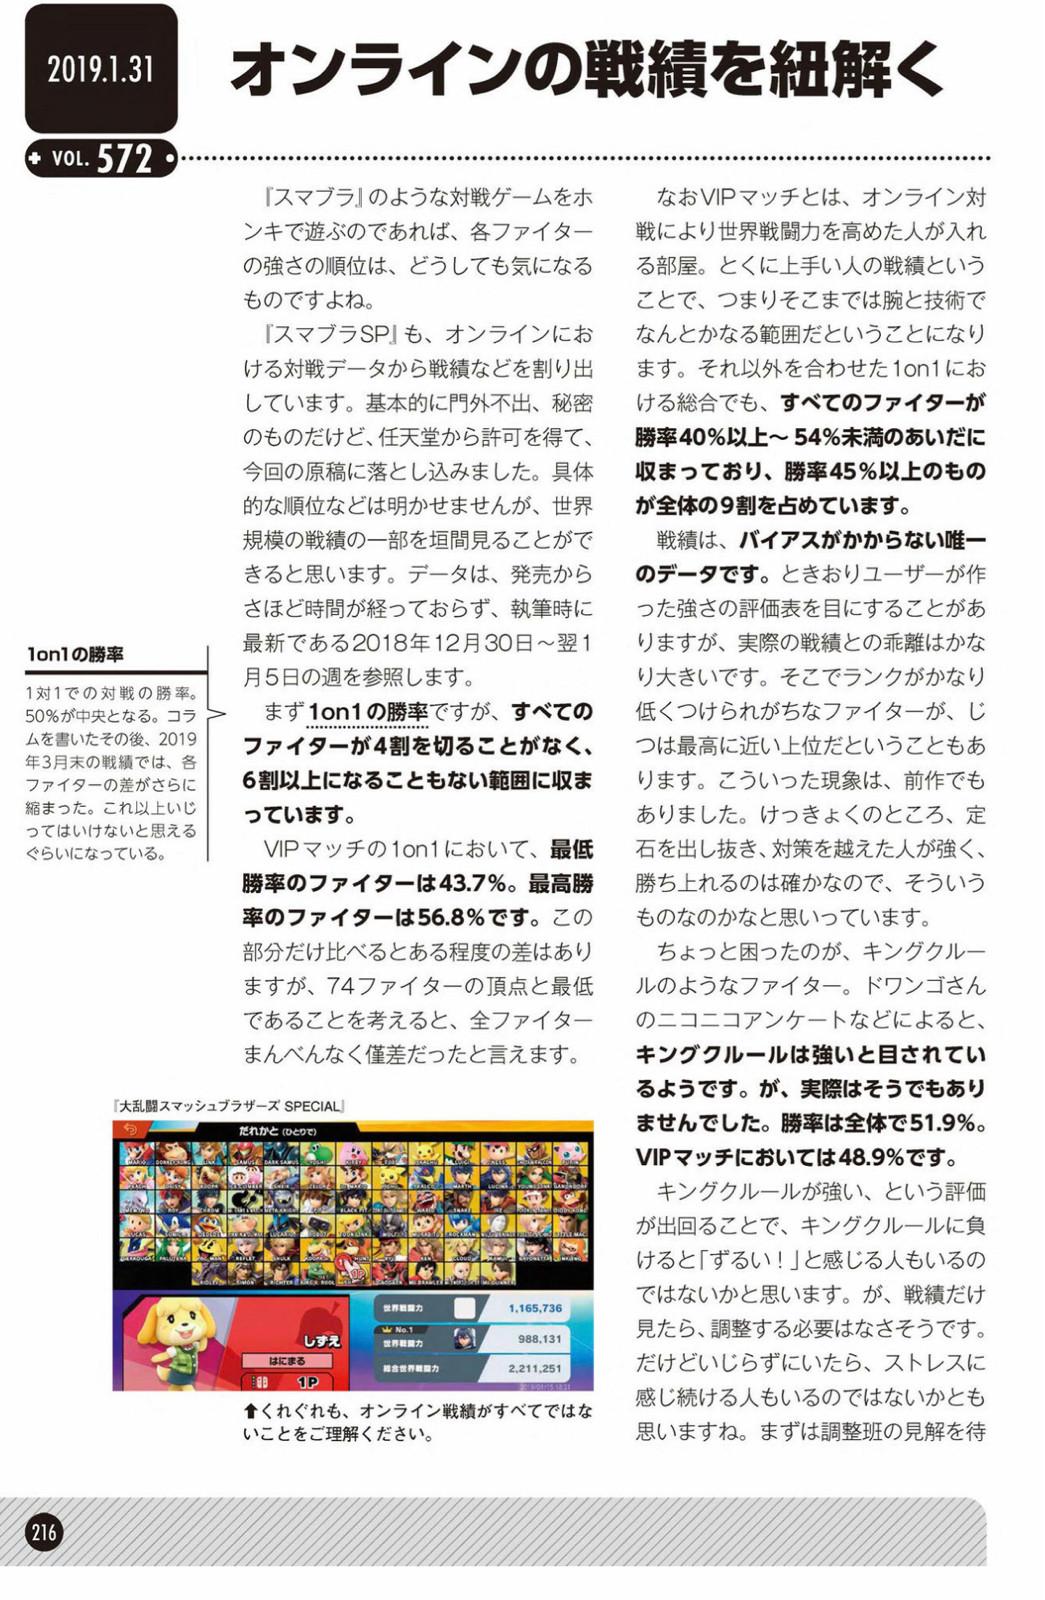 JqqNwYX - 【朗報】スマブラSP、v3.1.0アプデ予告!